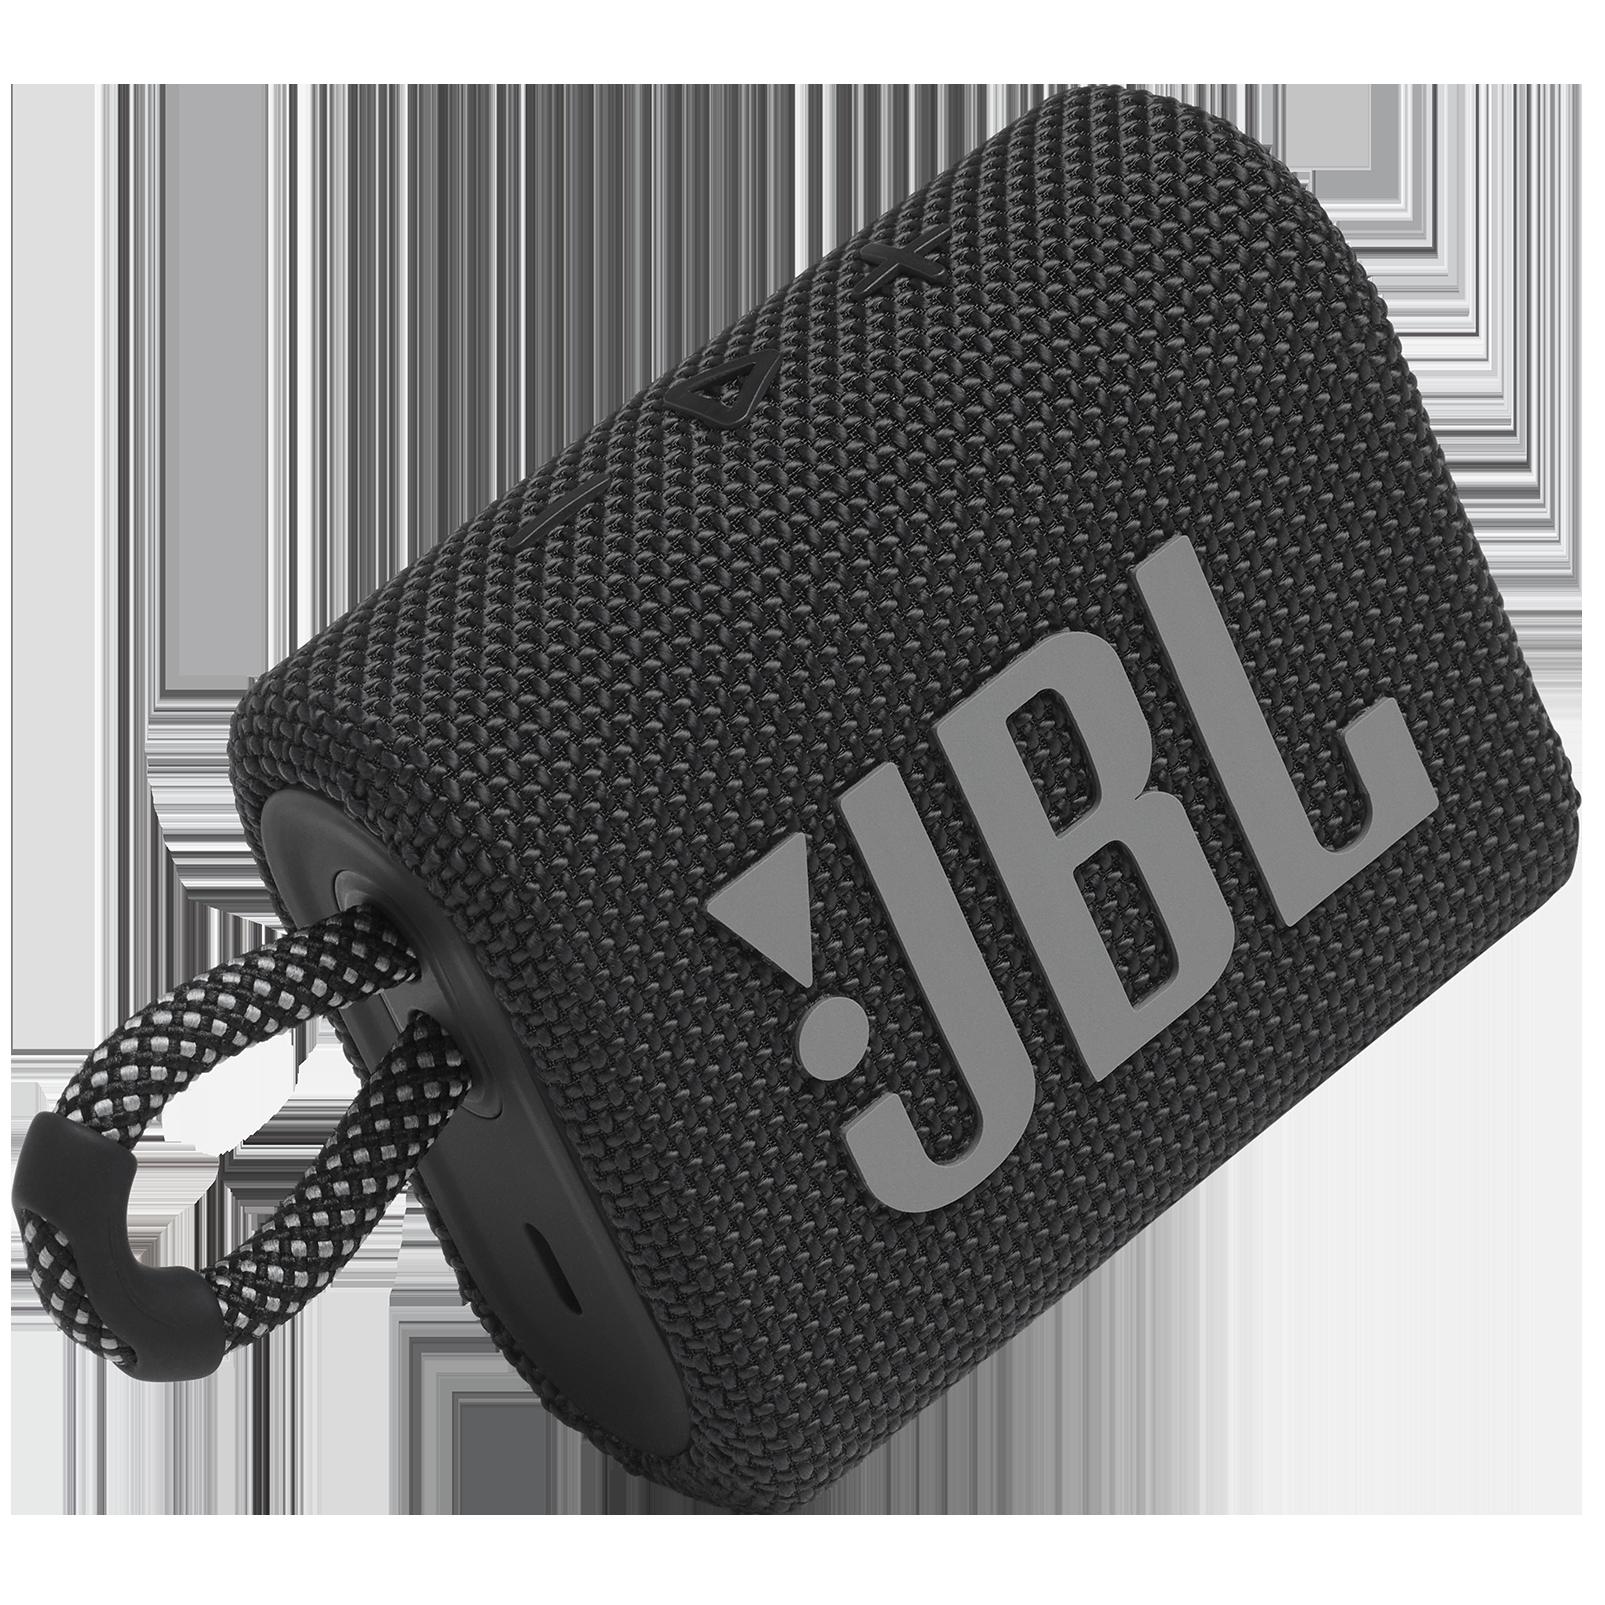 JBL Go 3 - Black - Portable Waterproof Speaker - Detailshot 1